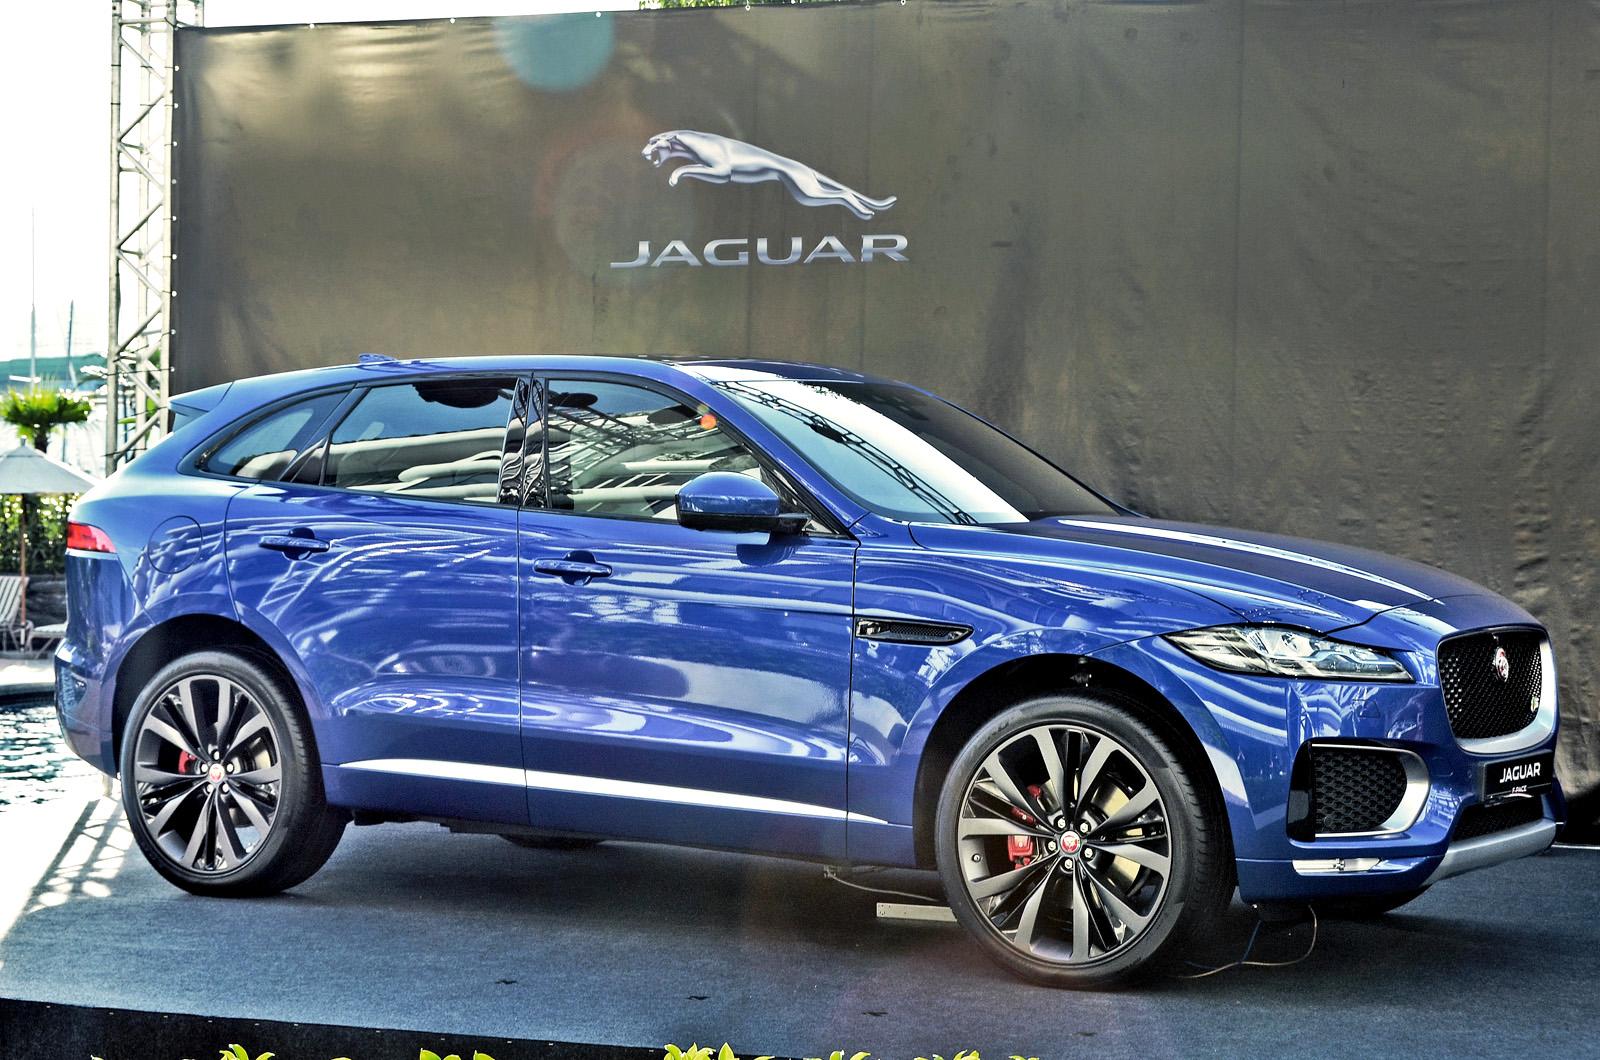 a8571a1da1 MGJMW News and Information Portal: Jaguar F-Pace In Hong Kong, circa ...